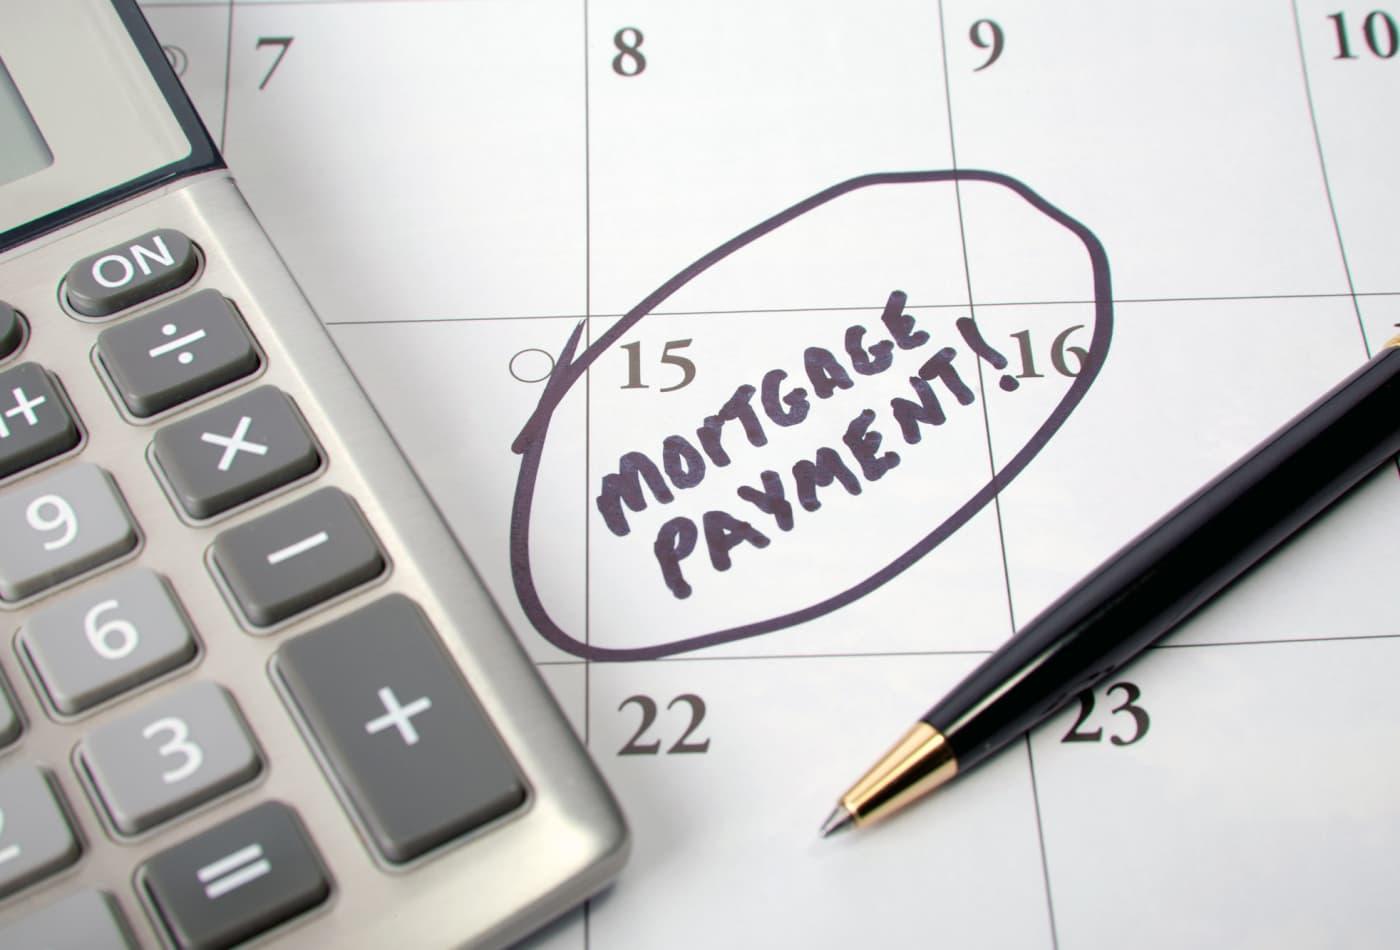 I just refinanced my mortgage, despite coronavirus. Here's what I learned